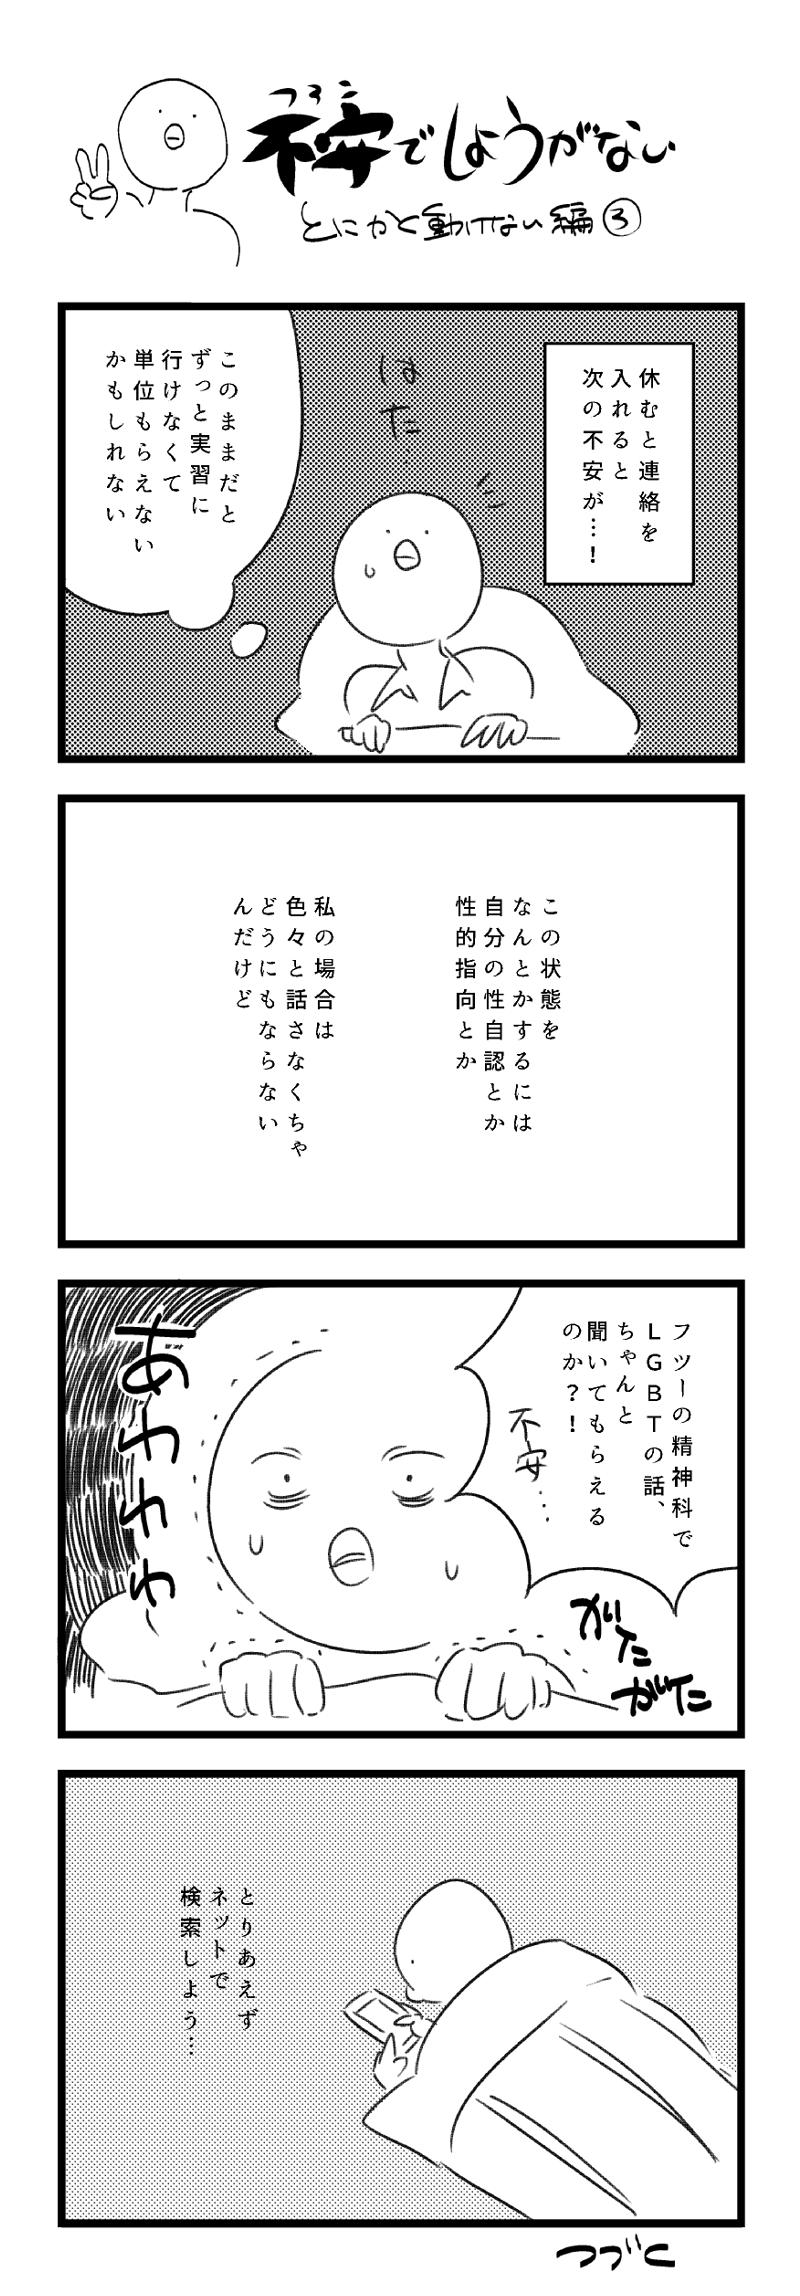 lgbt-health-manga-3